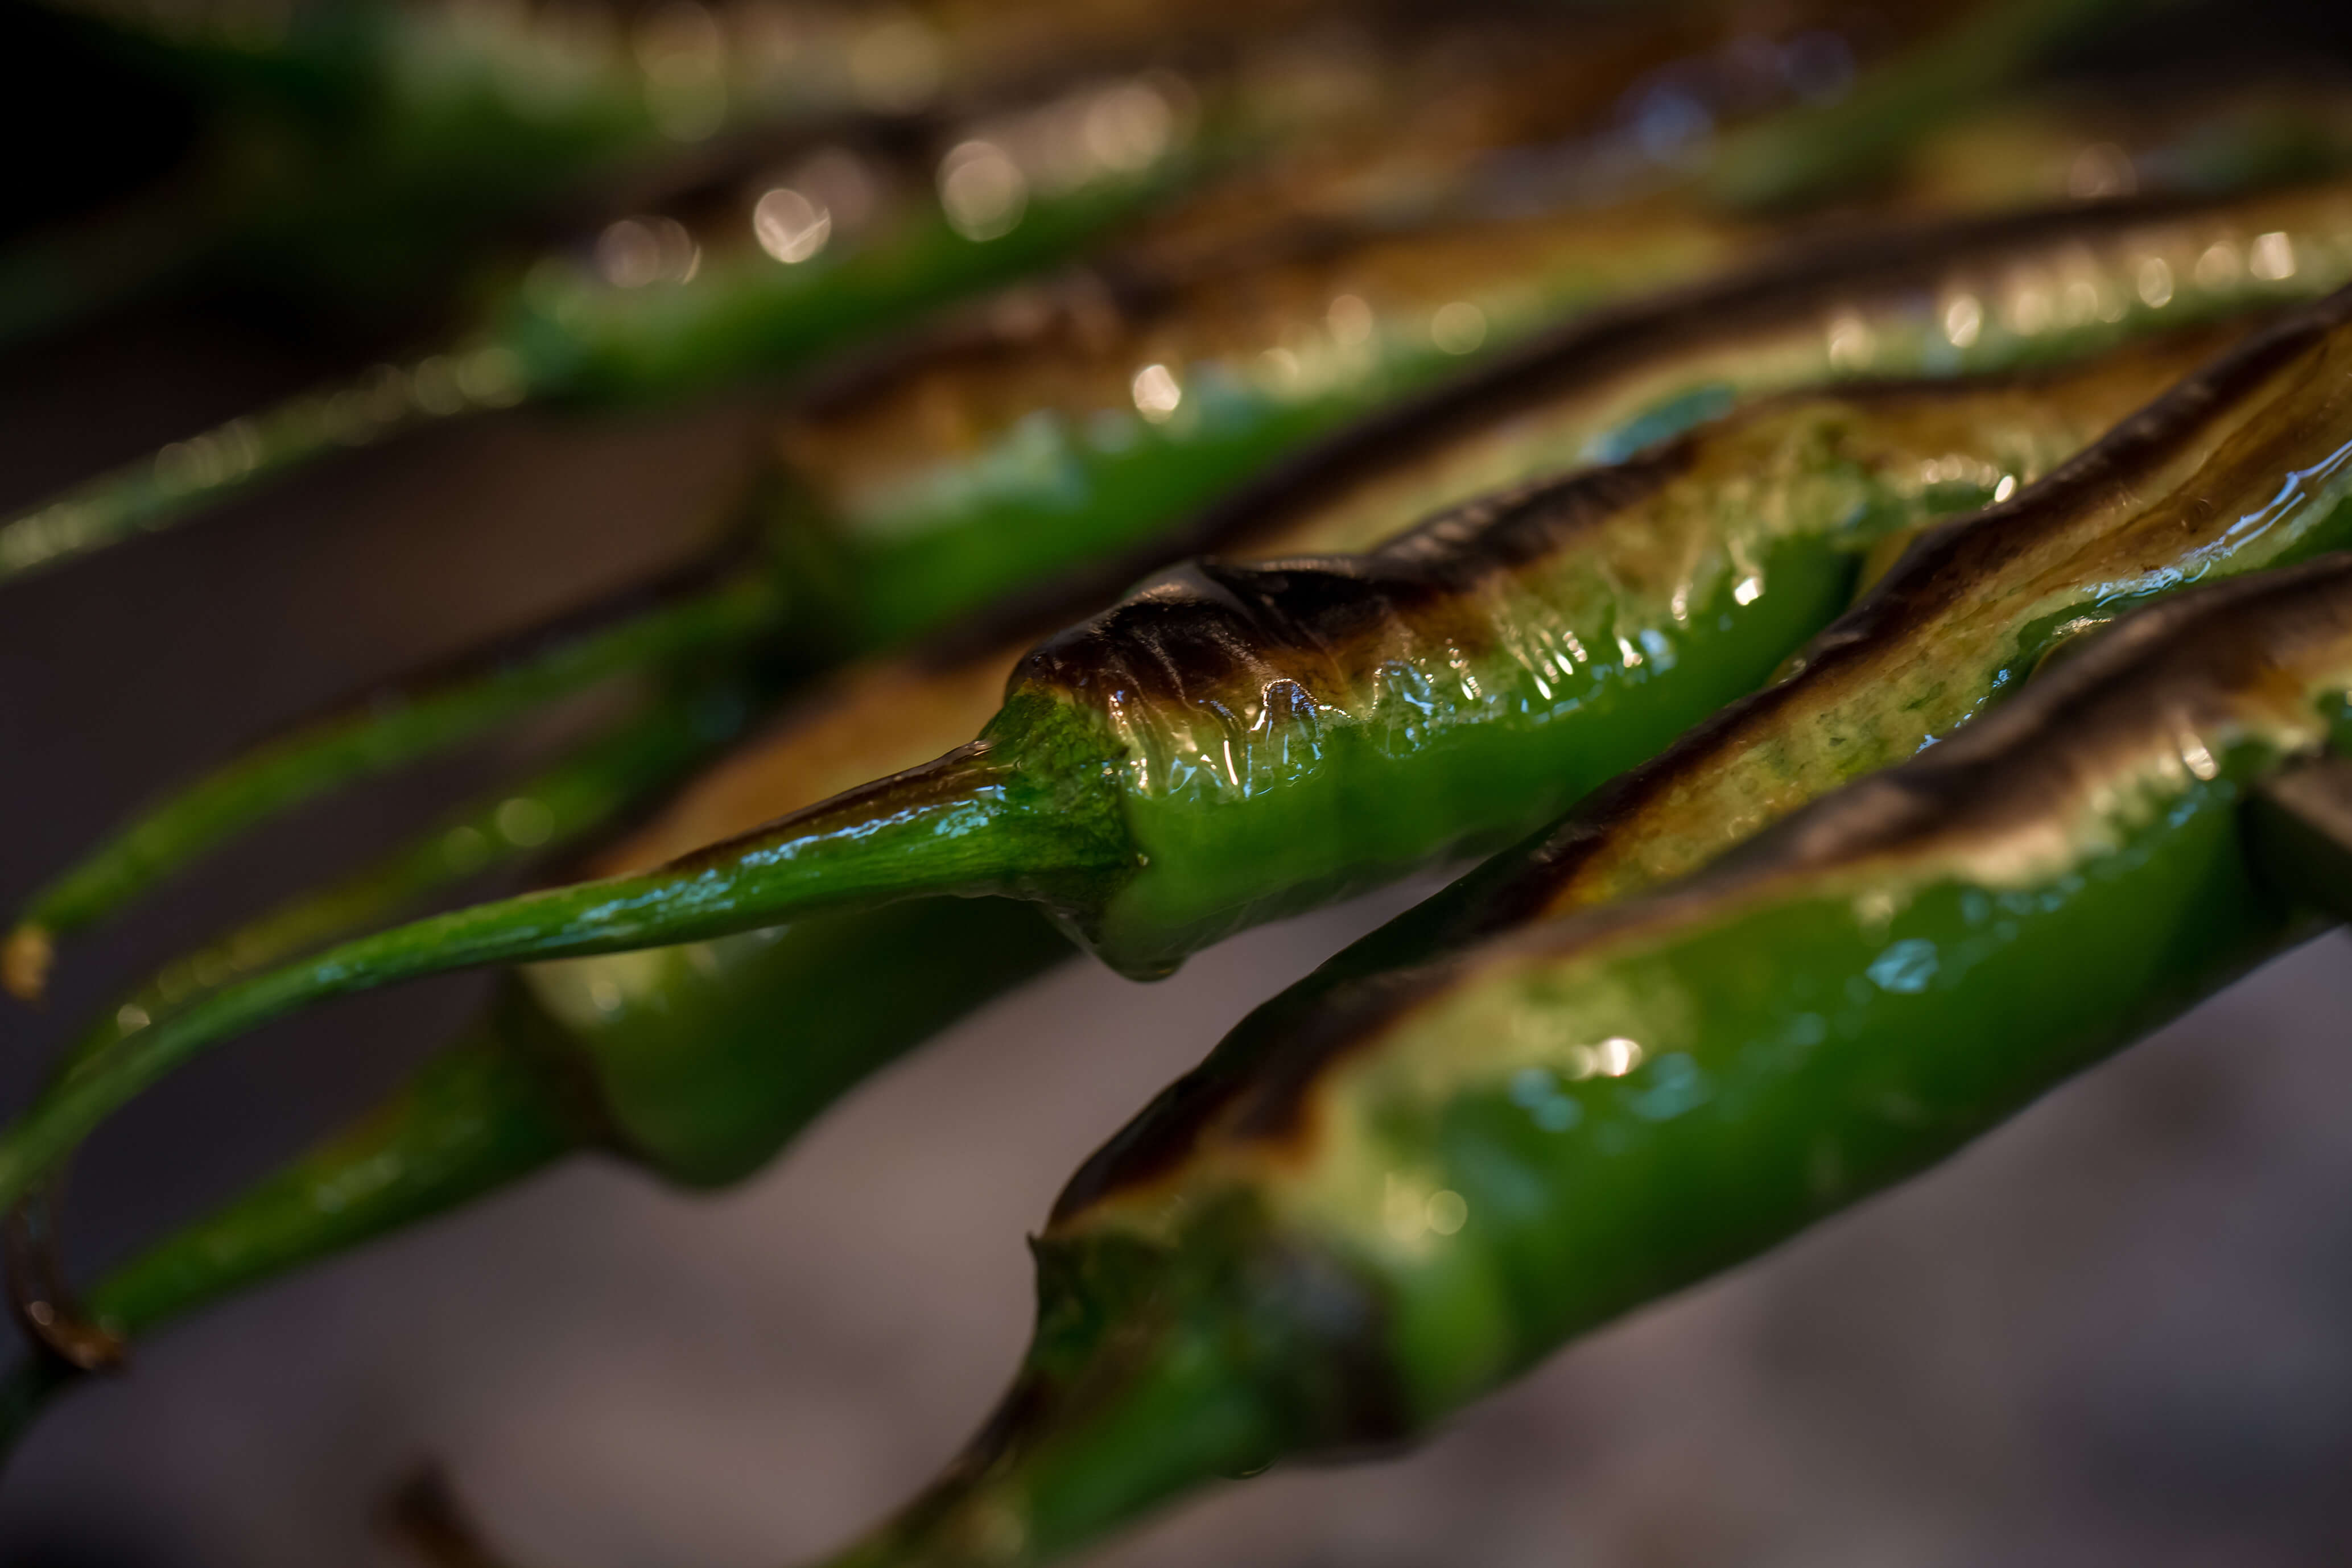 pepper, healthy food, abd el wahab restaurant, Lebanese cuisine, Lebanese food, delivery, London, UK, abdelwahab.co.uk